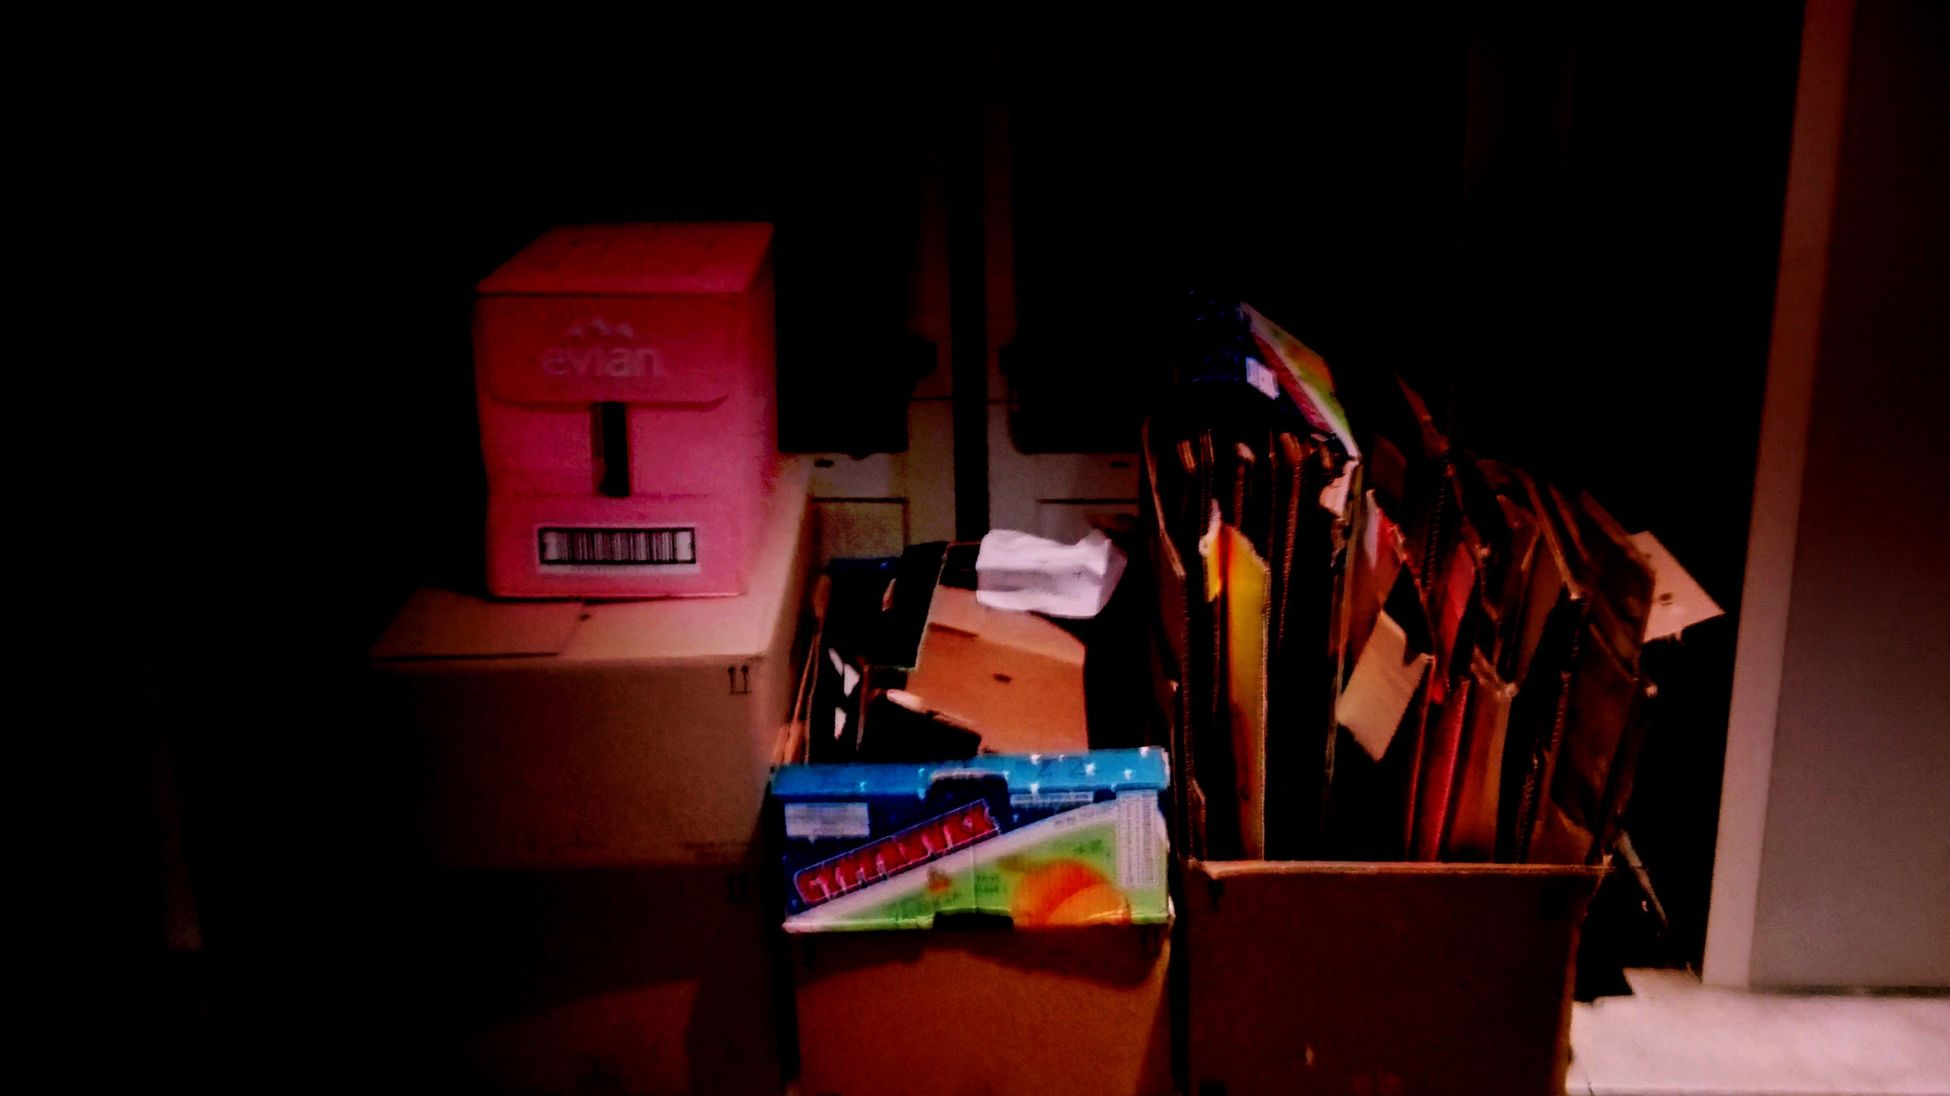 Technocity Nightphotography Looking For Water Box Pink Color No Passada Entre Ombre Et Lumiere France Ici Paris